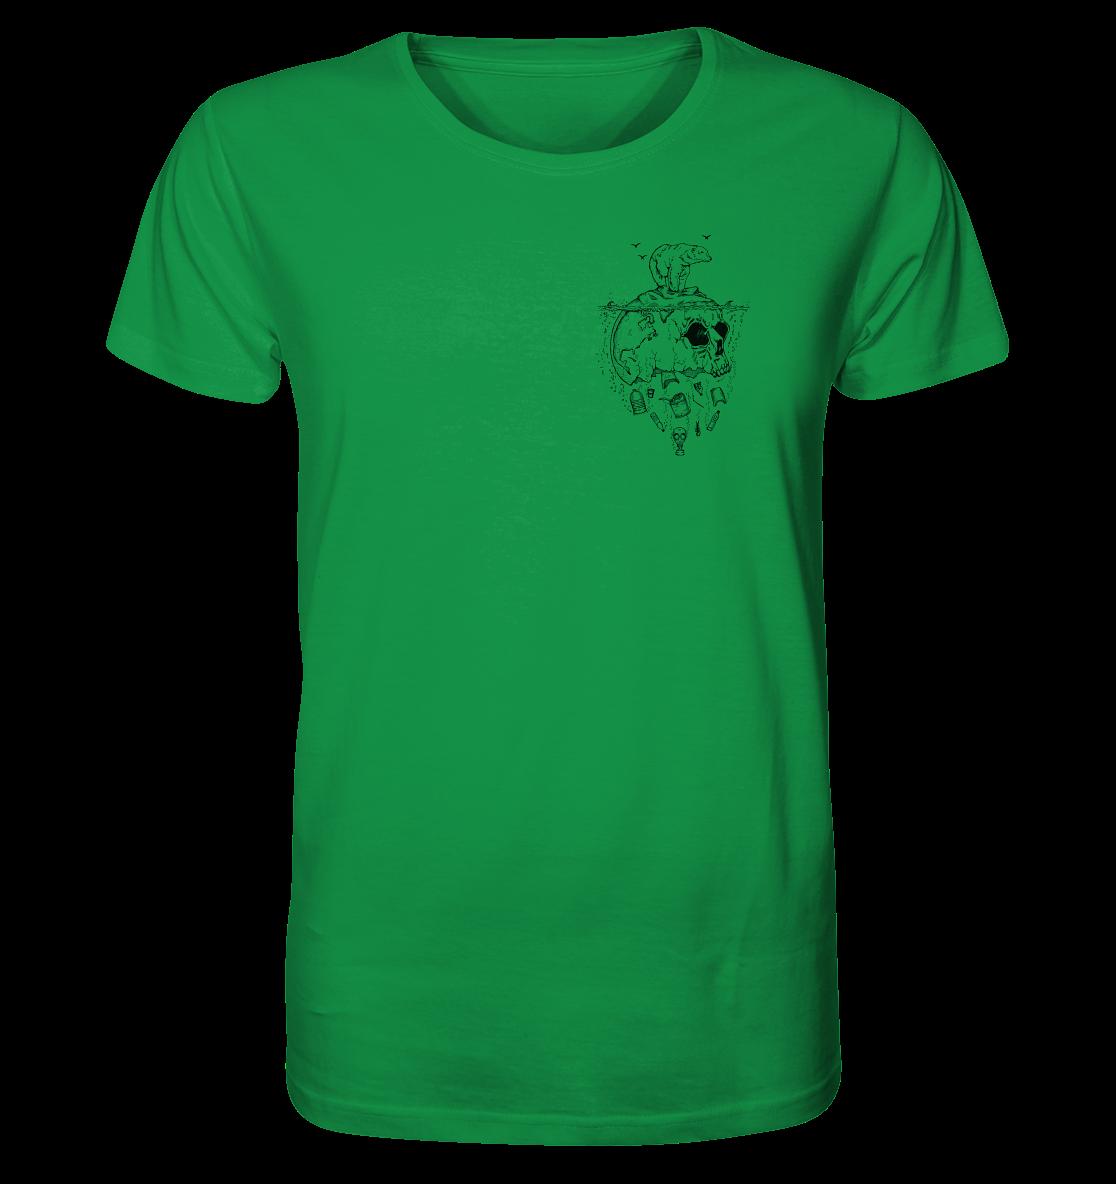 front-organic-shirt-149348-1116x-35.png